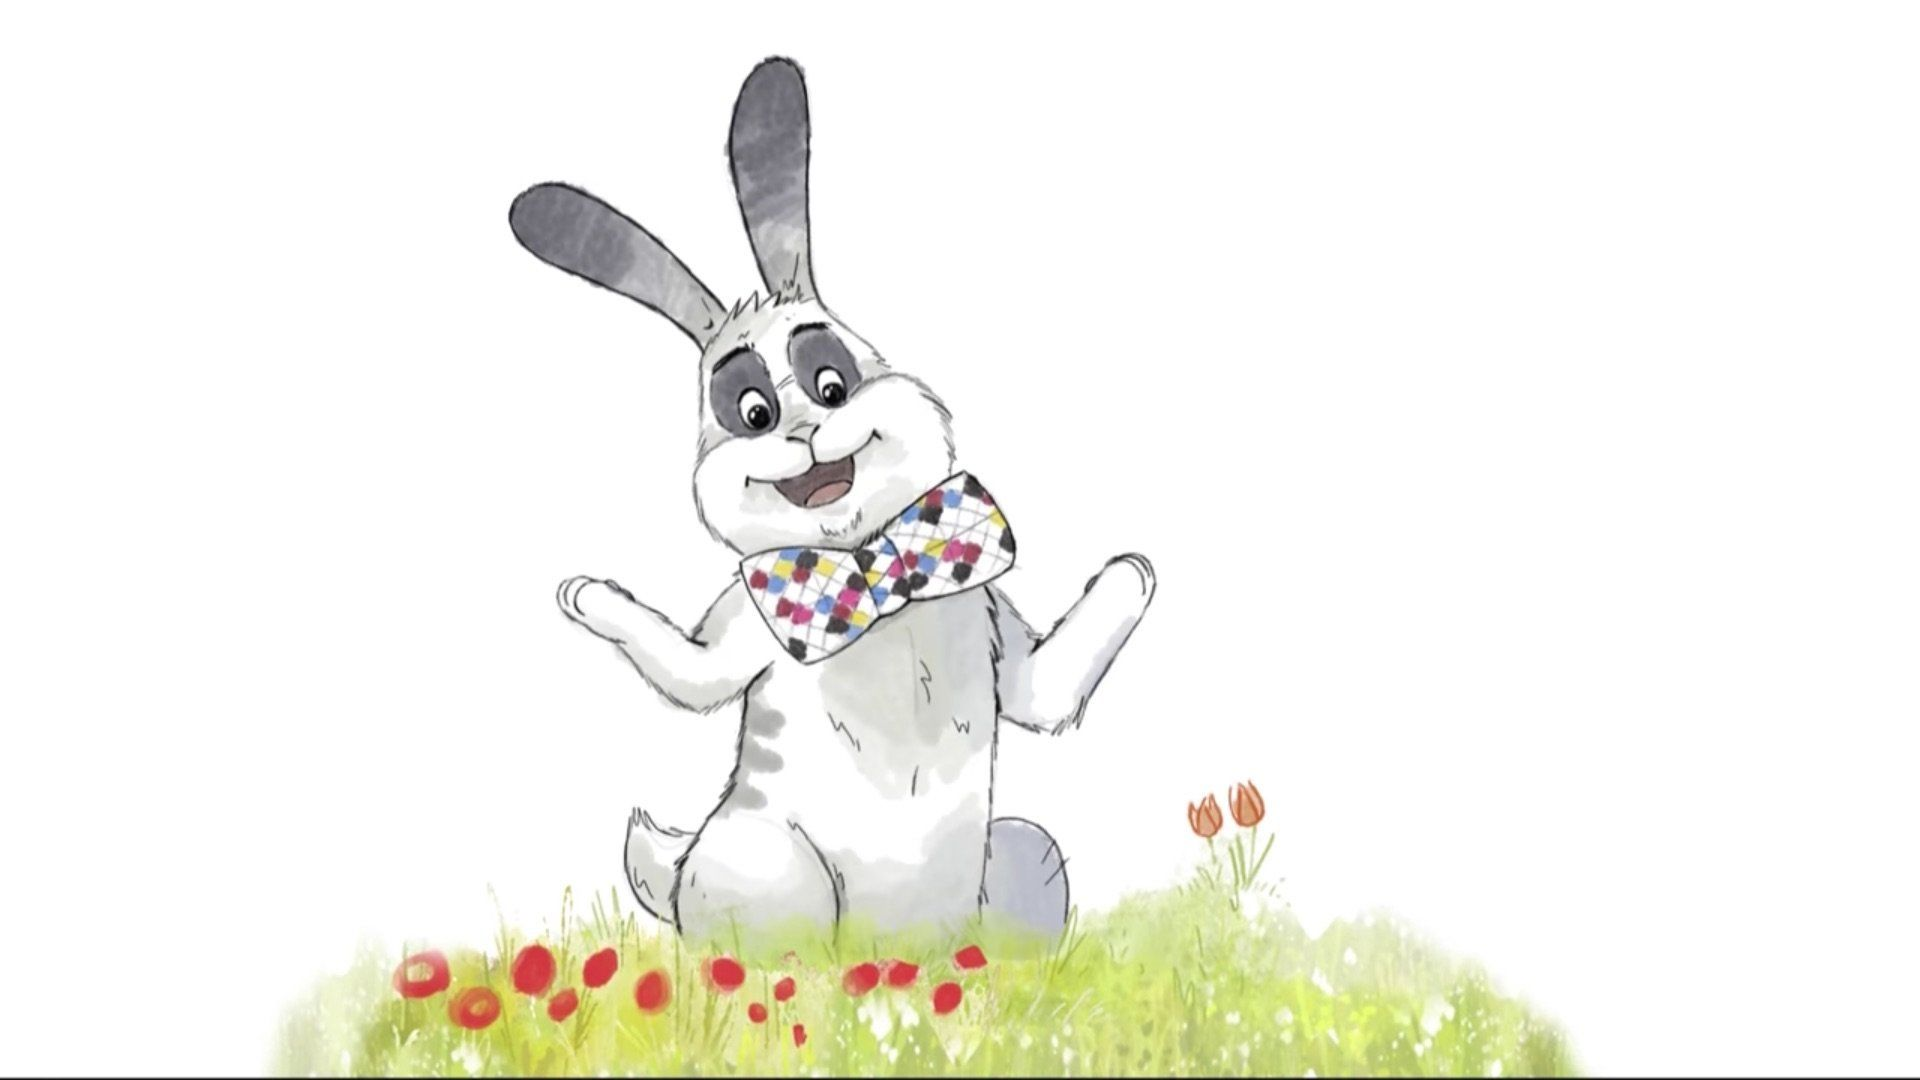 Gay Bunny Book Outsells Pence Family's Bunny Book